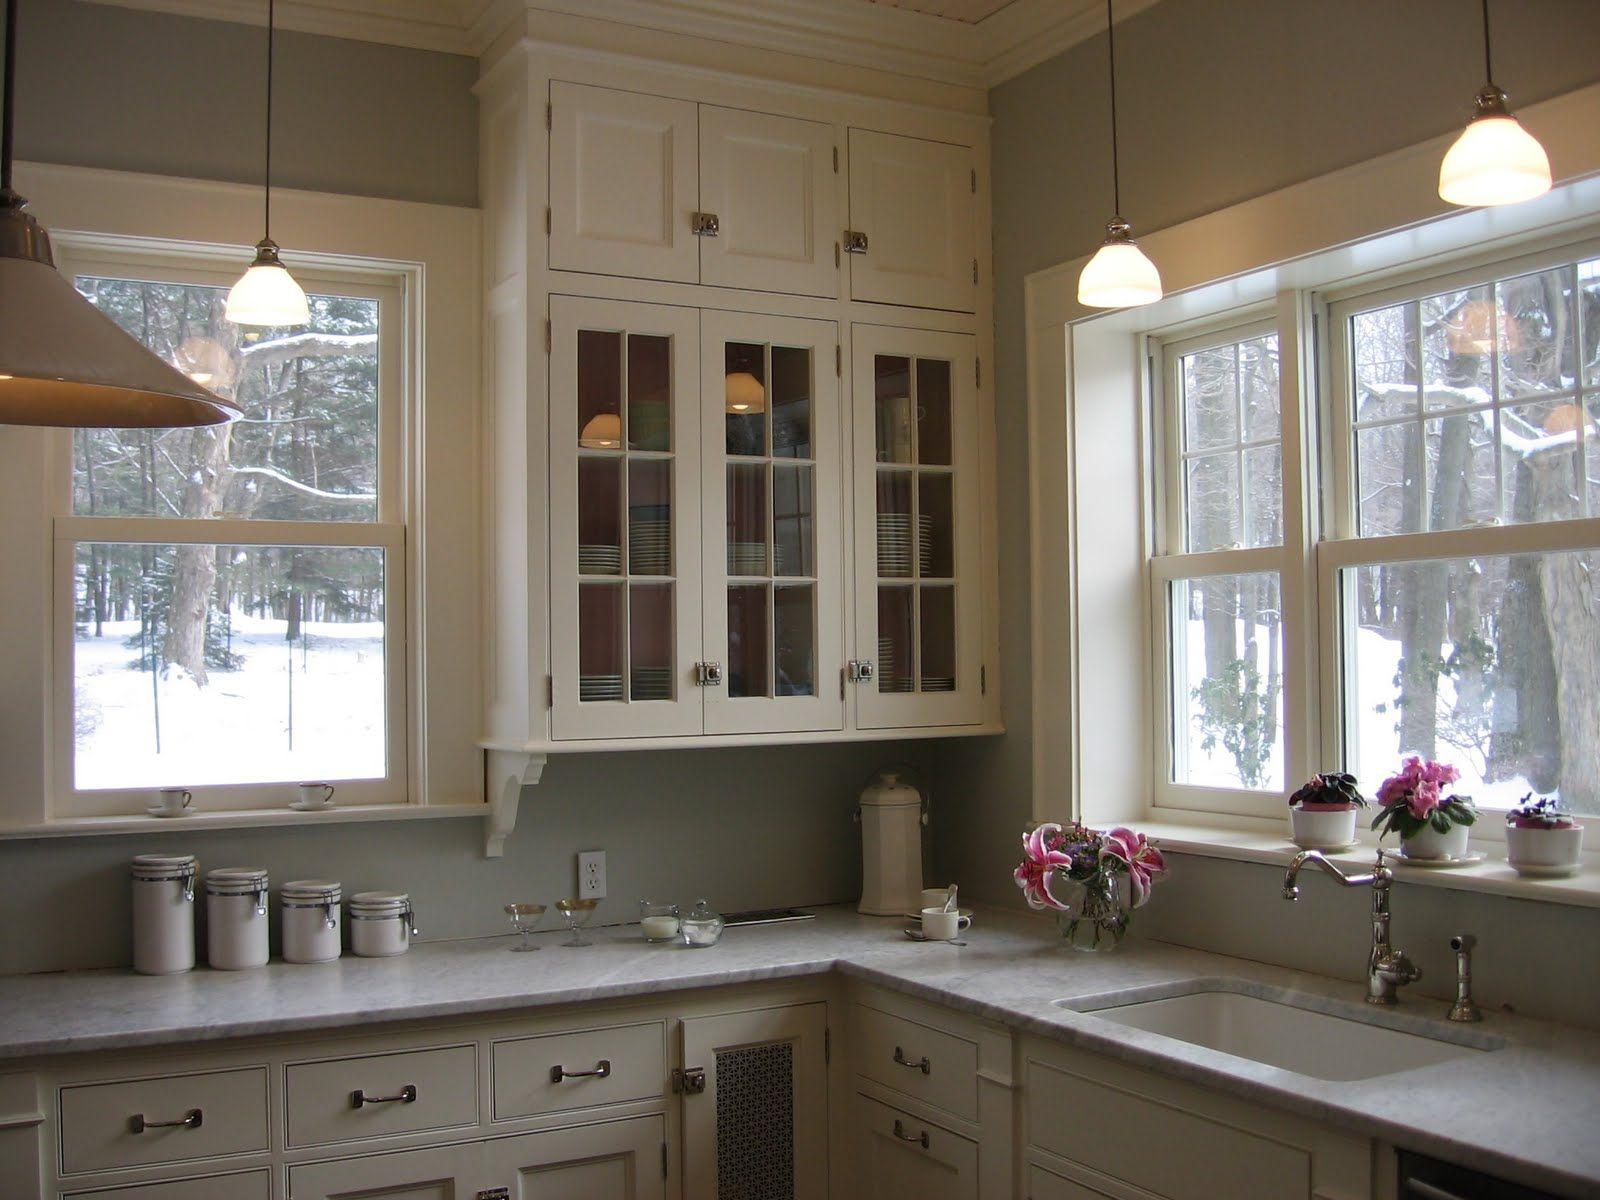 1930 Kitchen Design 1930s Kitchens Original 1930 to